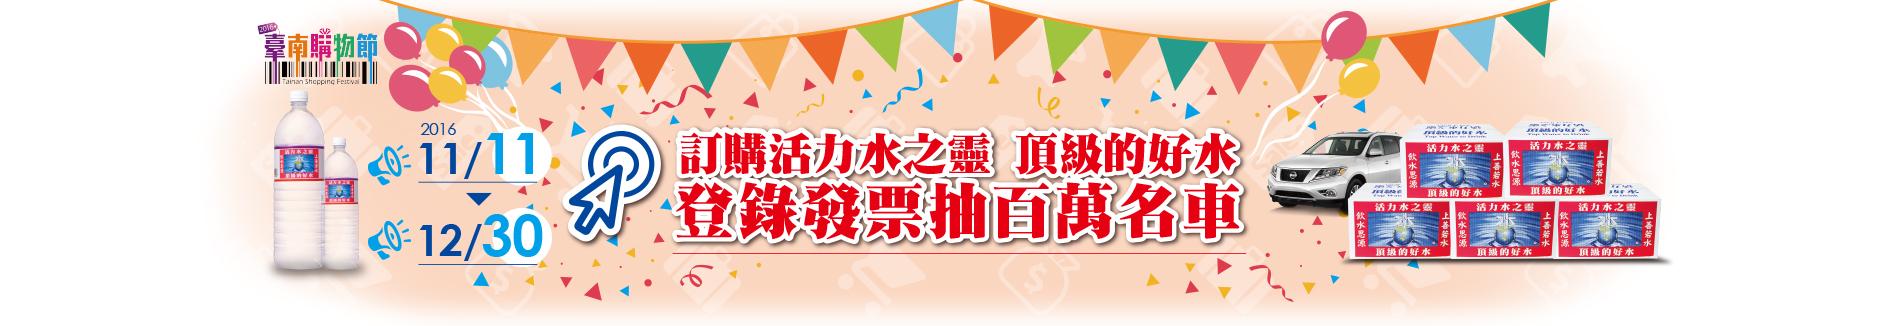 tainan-shopping-festival